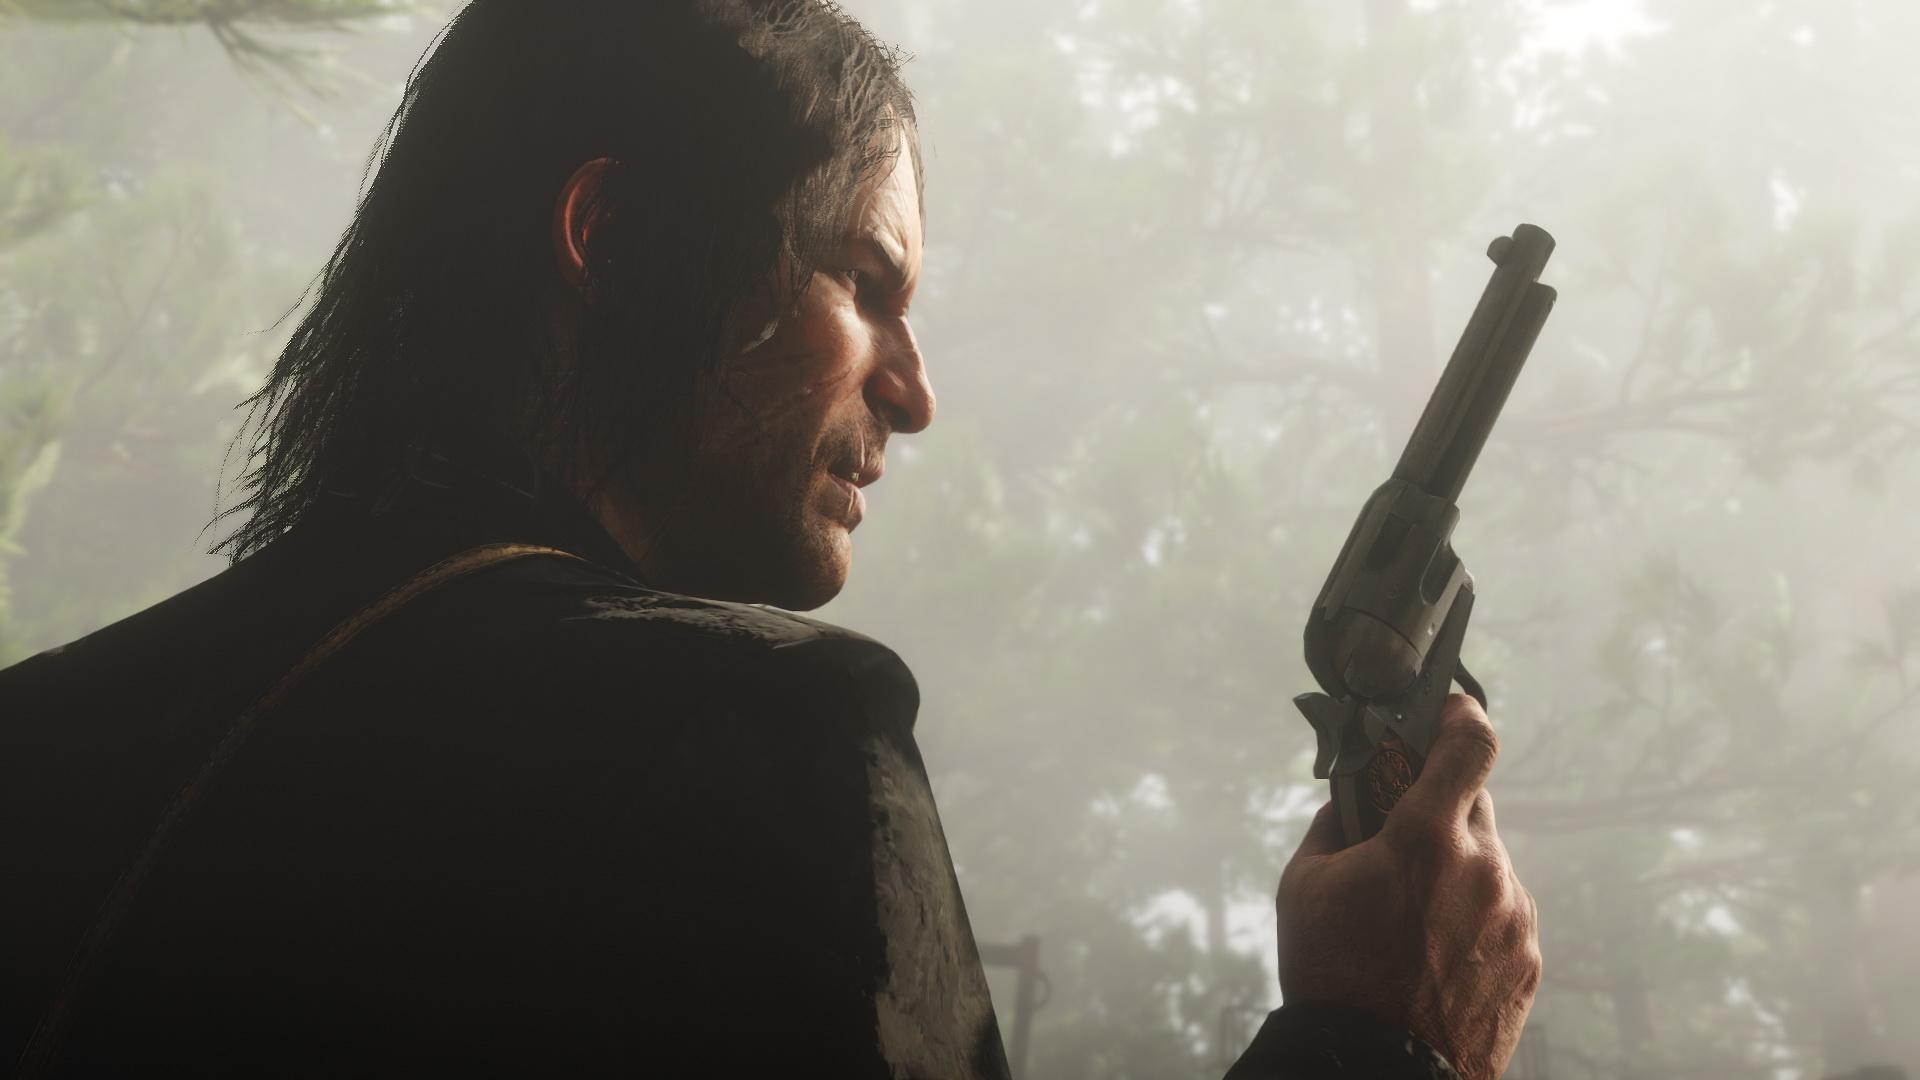 Red Dead Redemption 2, Rockstar Games, PlayStation 4 - Walmart com